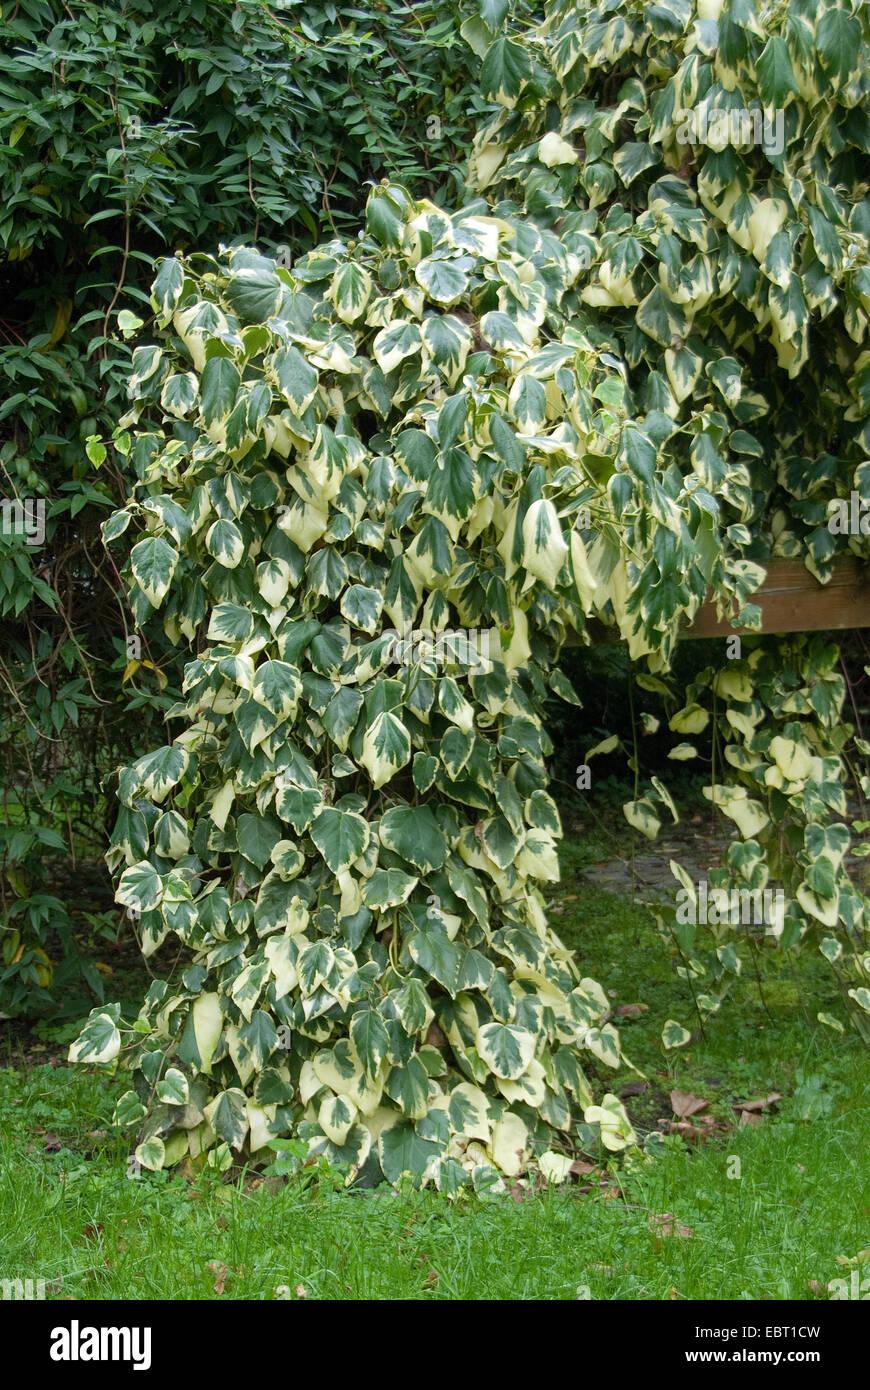 Persian Ivy, Colchis Ivy (Hedera colchica 'Dentata Variegata', Hedera colchica Dentata Variegata), cultivar Dentata Variegata Stock Photo